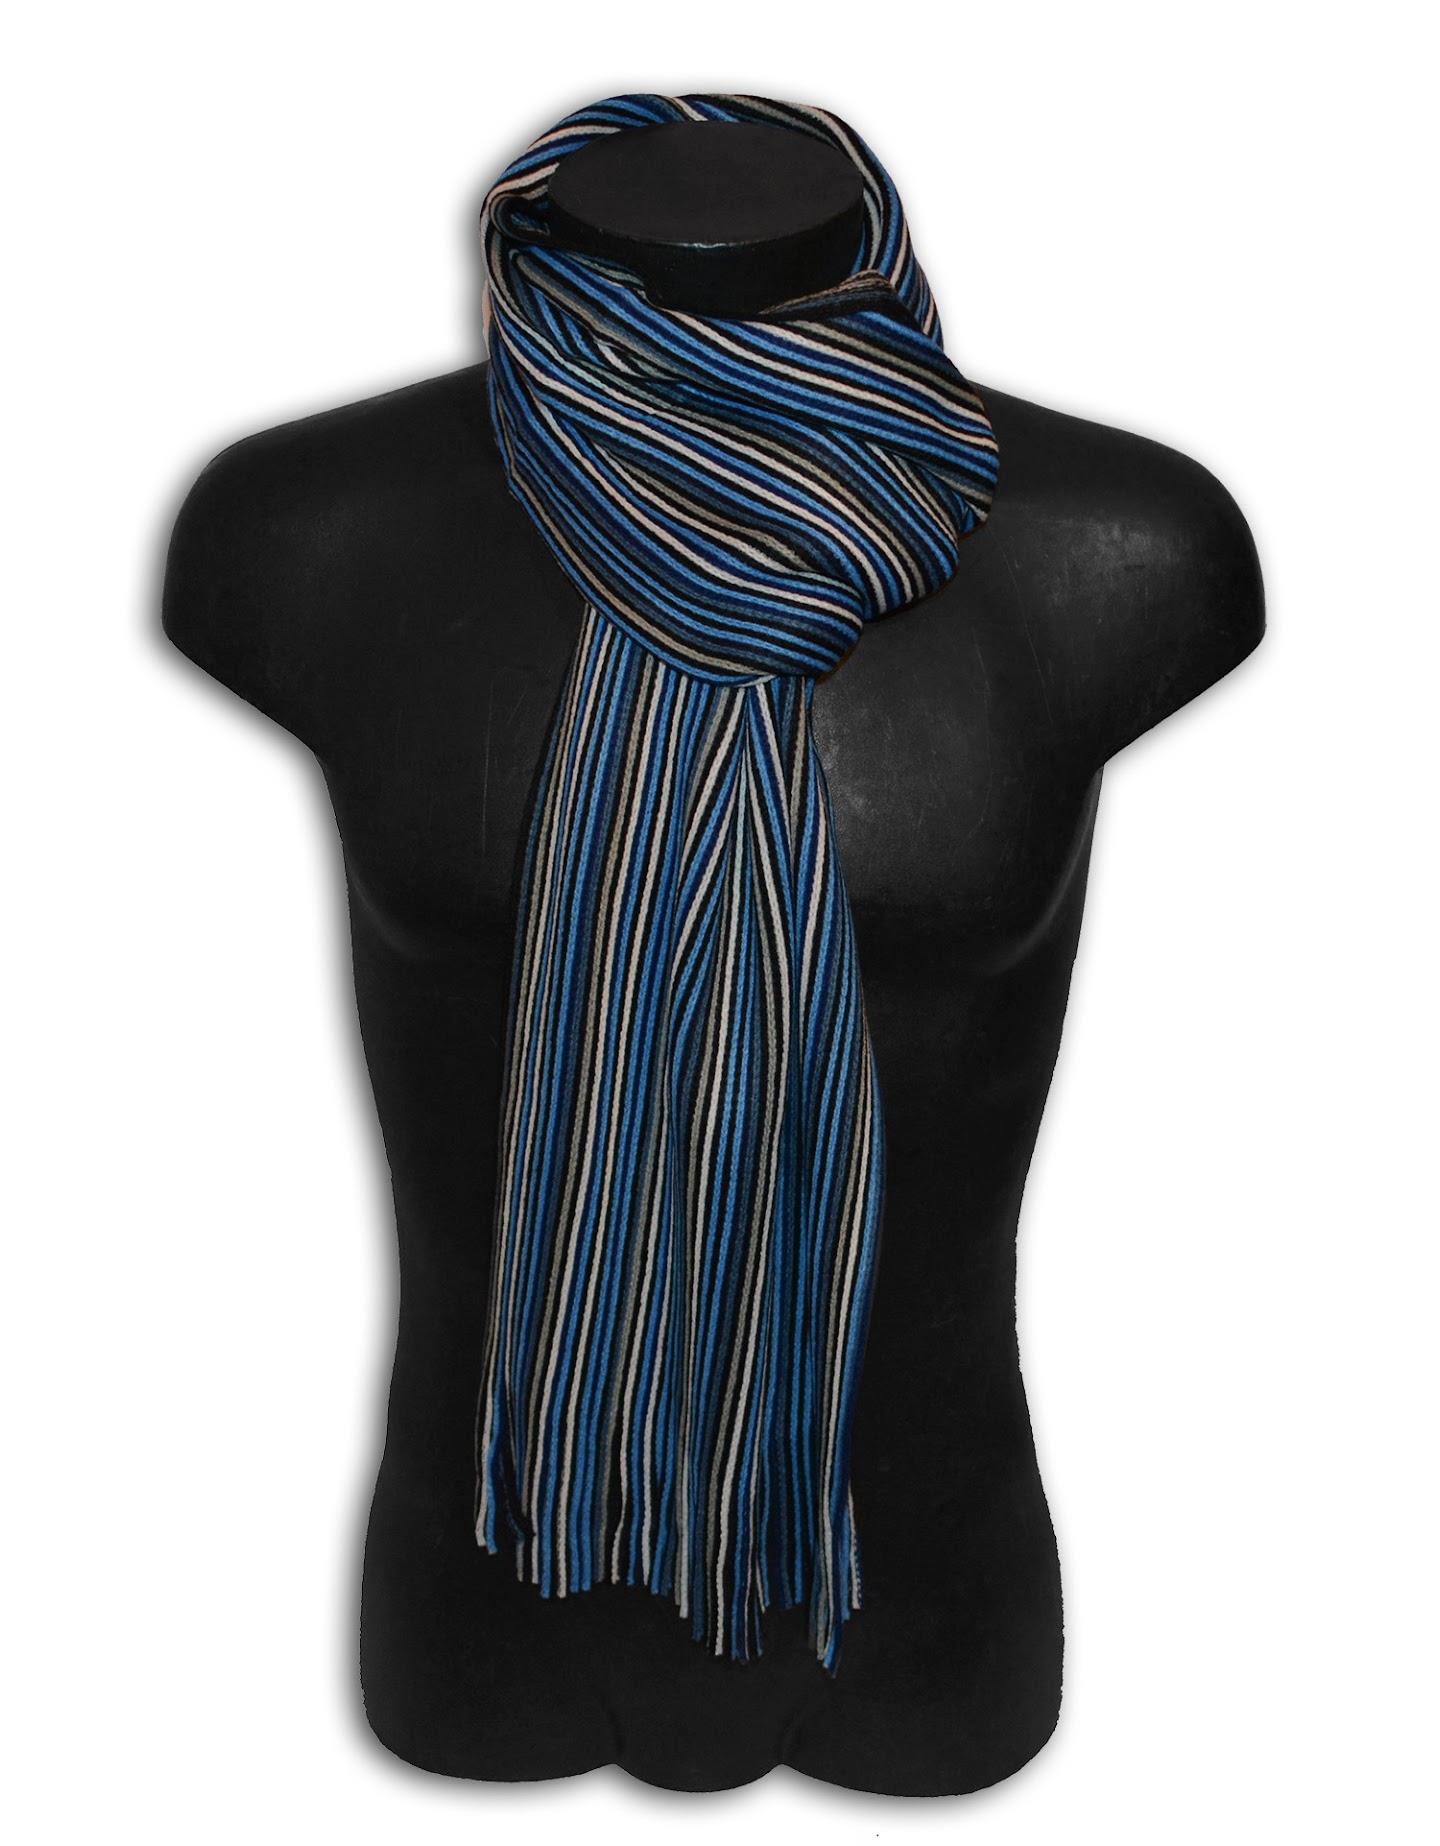 pashmina schal mann frau streifen wei blau blau schwarz grau s ebay. Black Bedroom Furniture Sets. Home Design Ideas